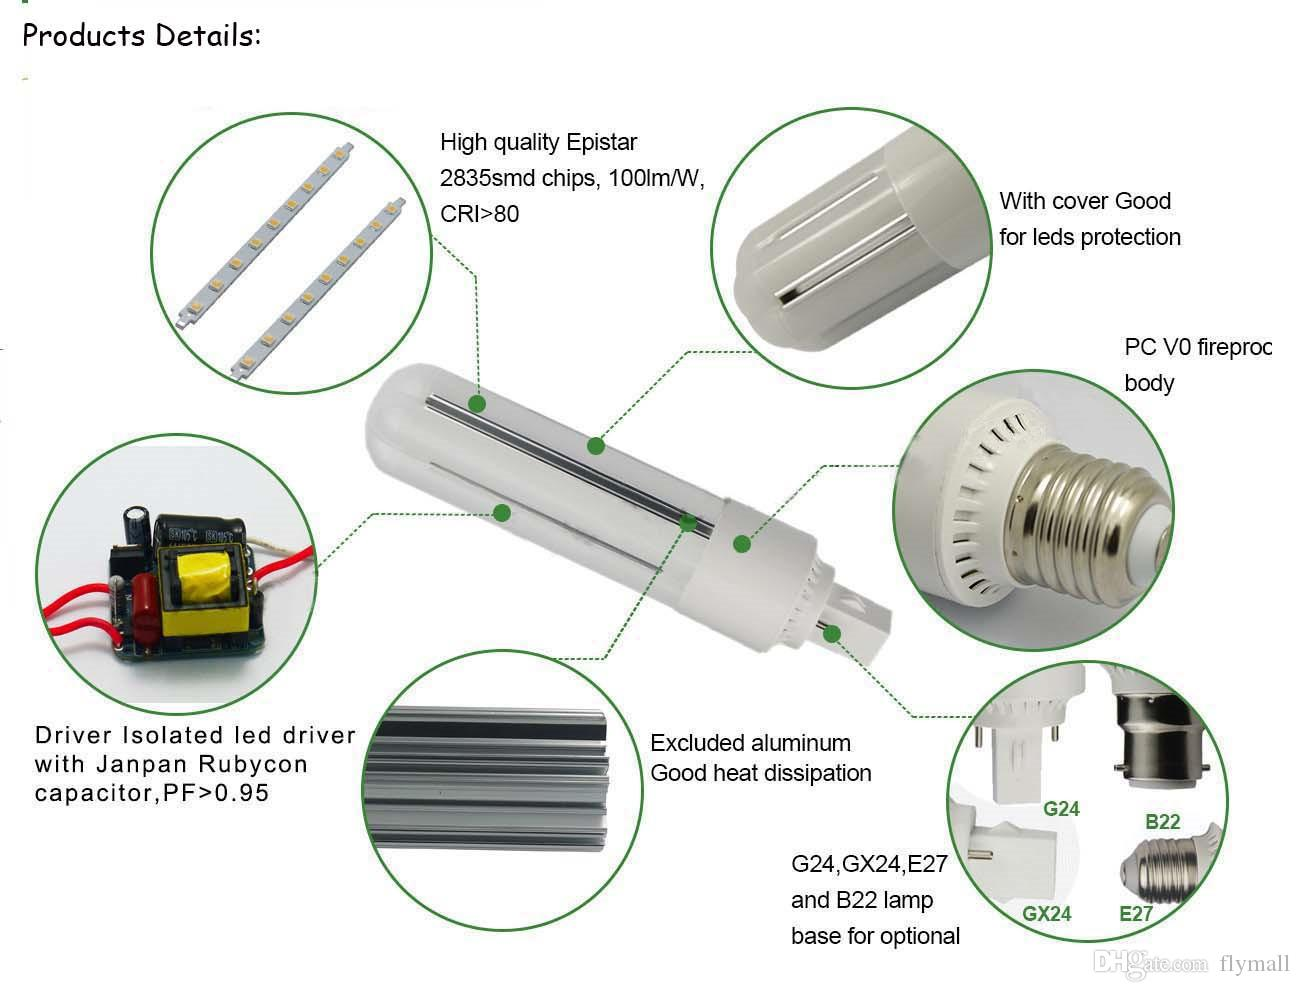 New Design PL Light LED Corn Bulb Light 9W 12W 15W 18W E27 G24 Led Bulbs Lamp 360 Degree AC 110-240V Warm/Cool White + 2 Years Warranty